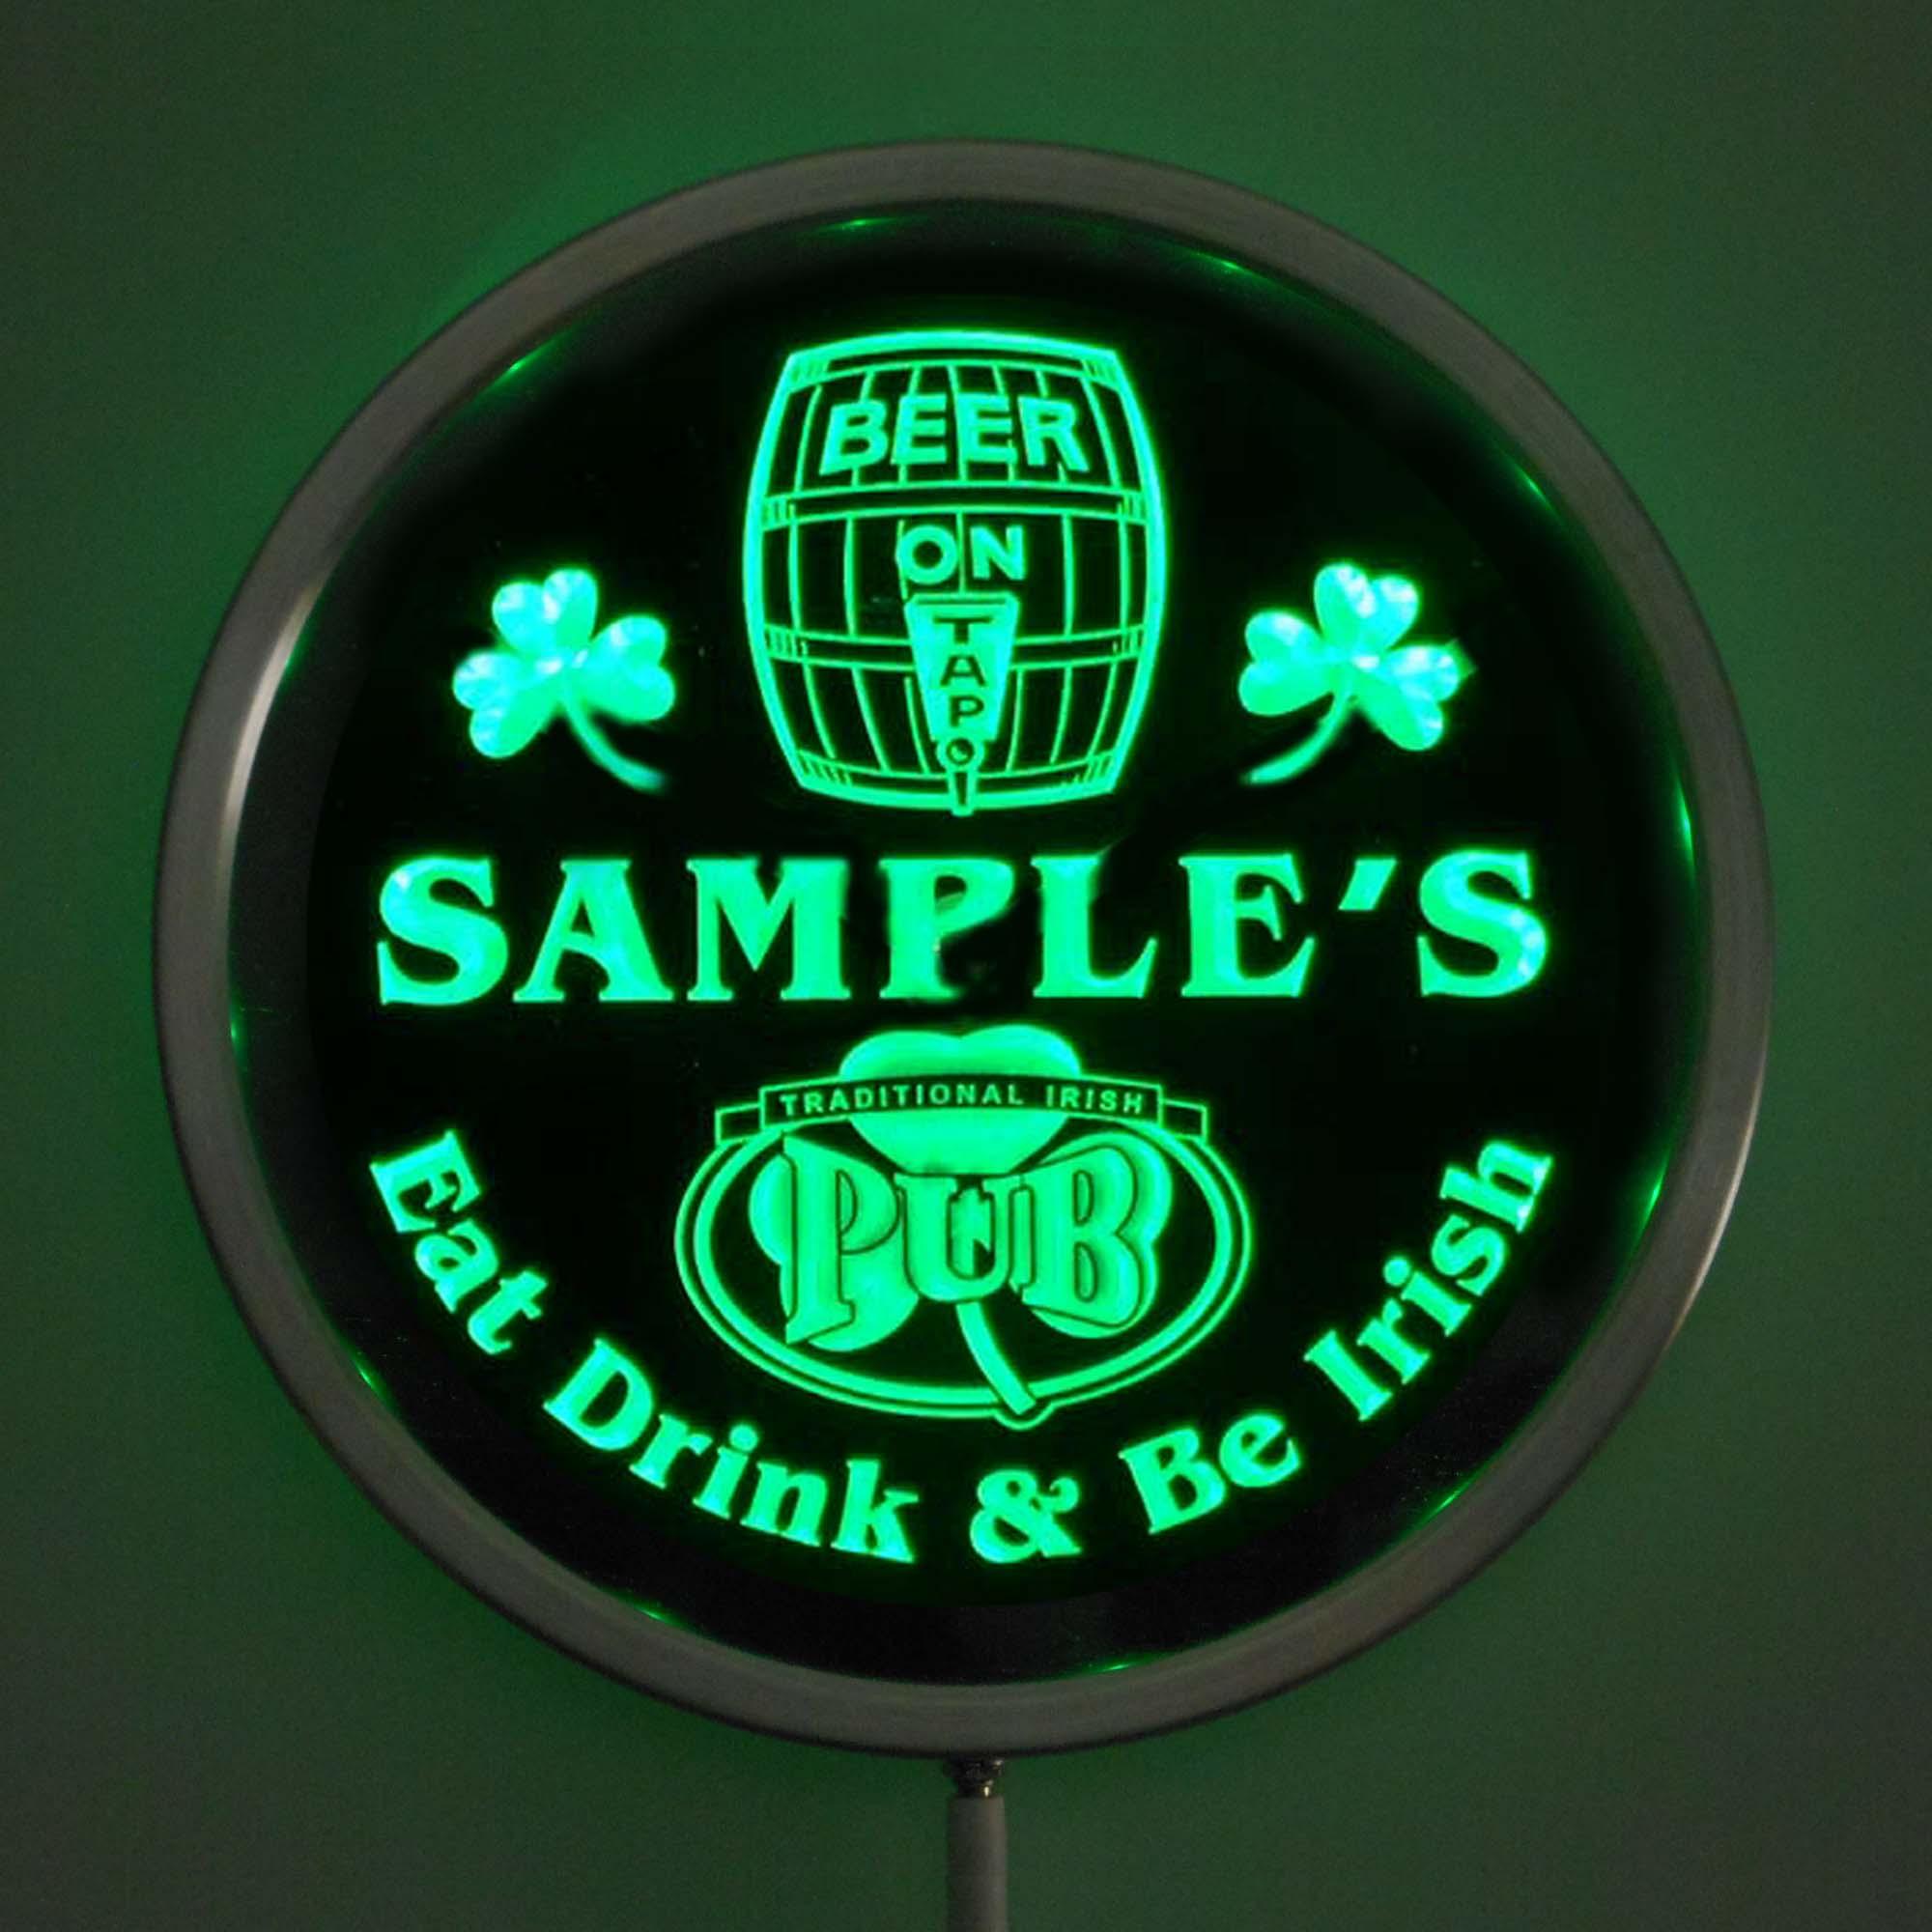 rs-pa-tm Custom LED Neon Round Signs 25cm/ 10 Inch - Personalized Irish Pub Bar Sign RGB Multi-Color Remote Wireless Control